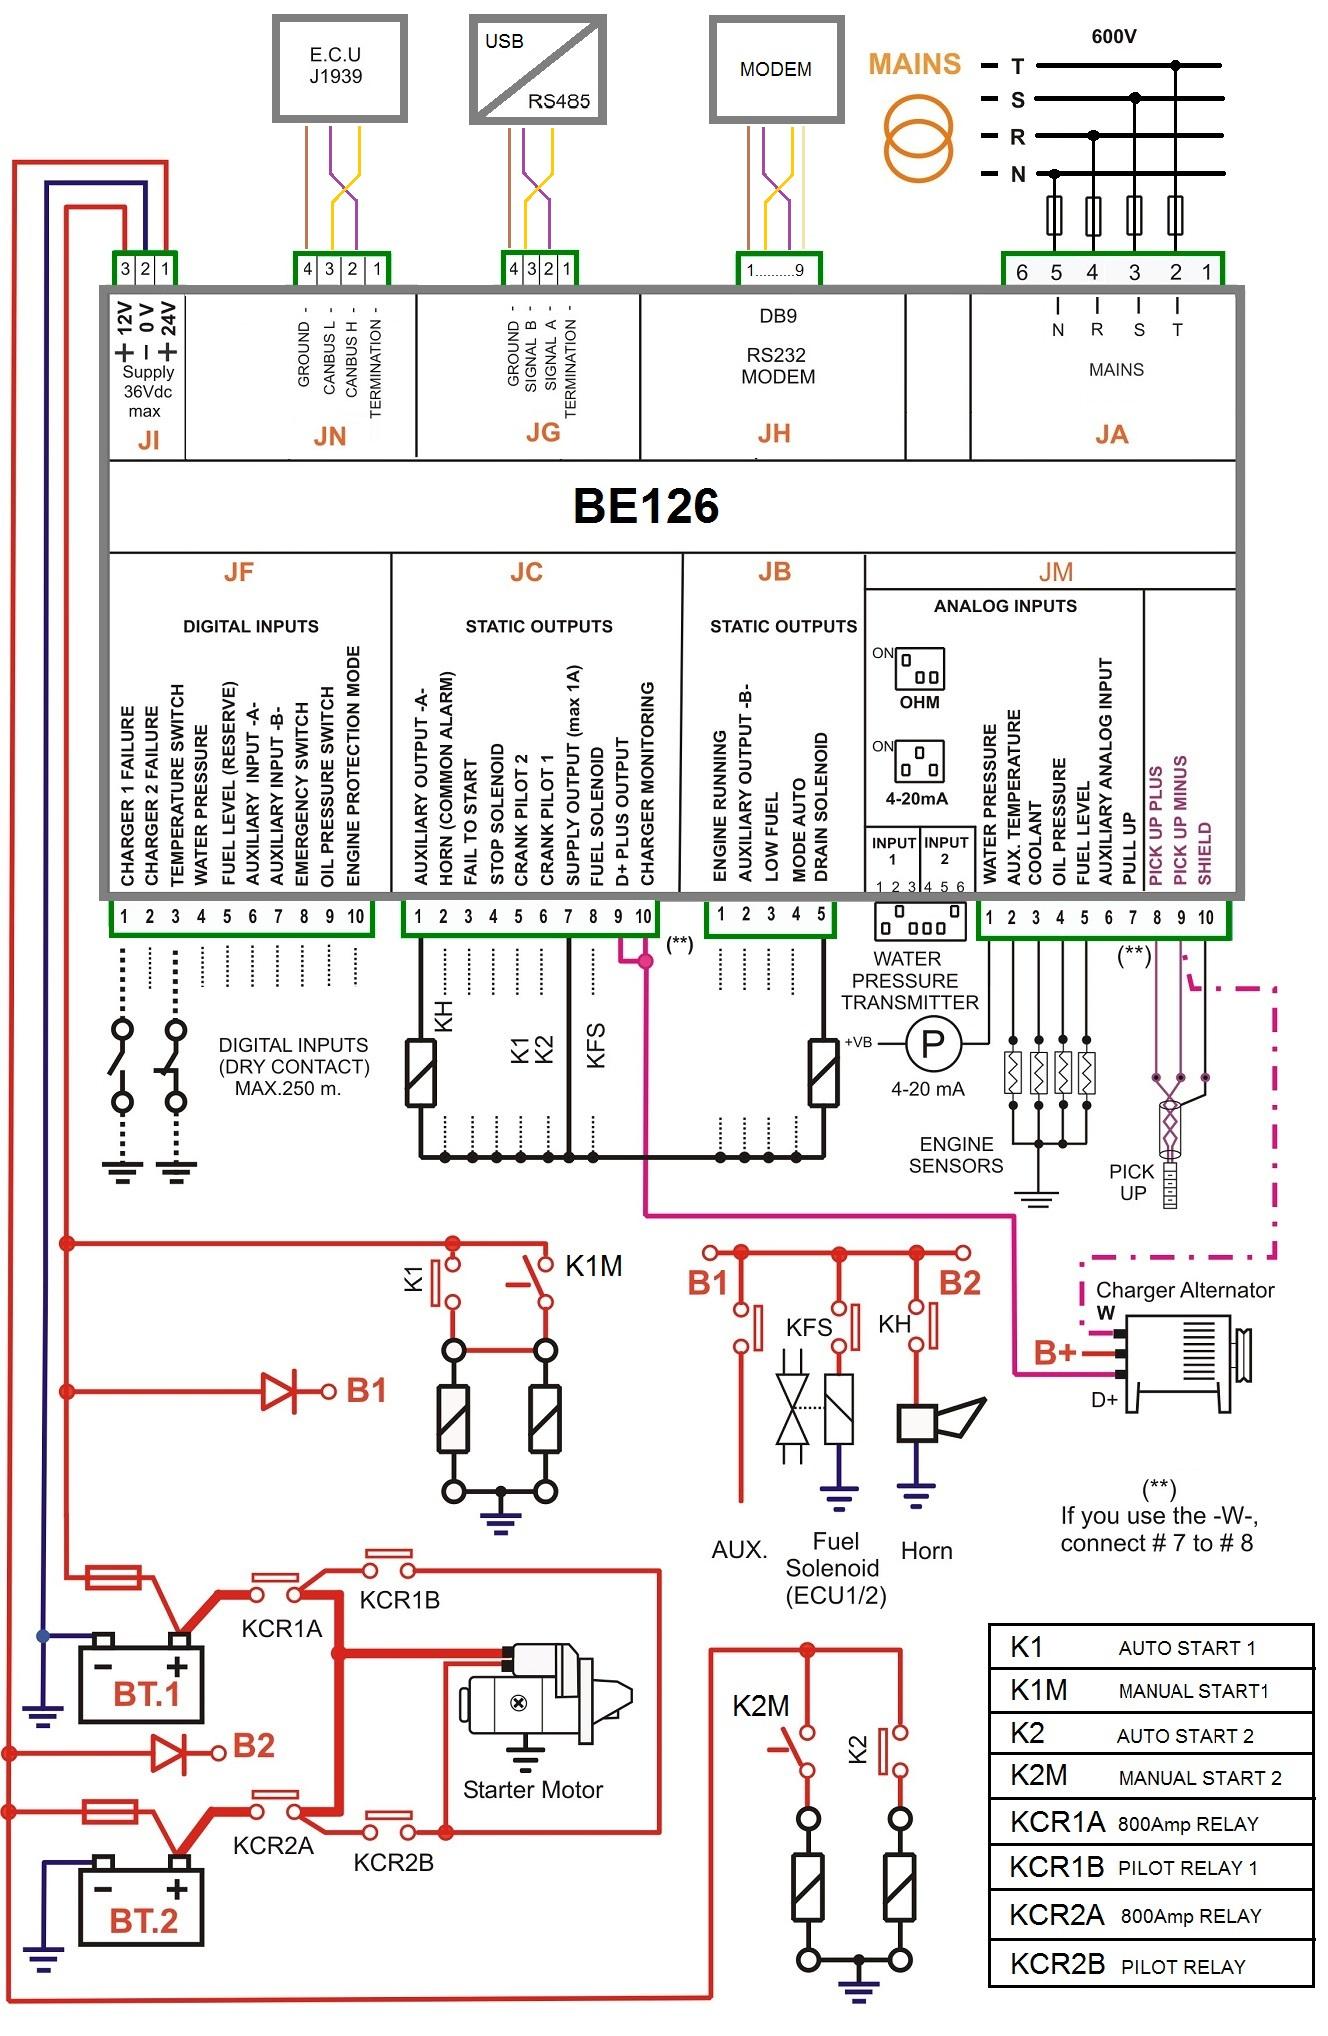 220 Pump Wire Diagram | Manual E-Books - 220V Pool Pump Wiring Diagram